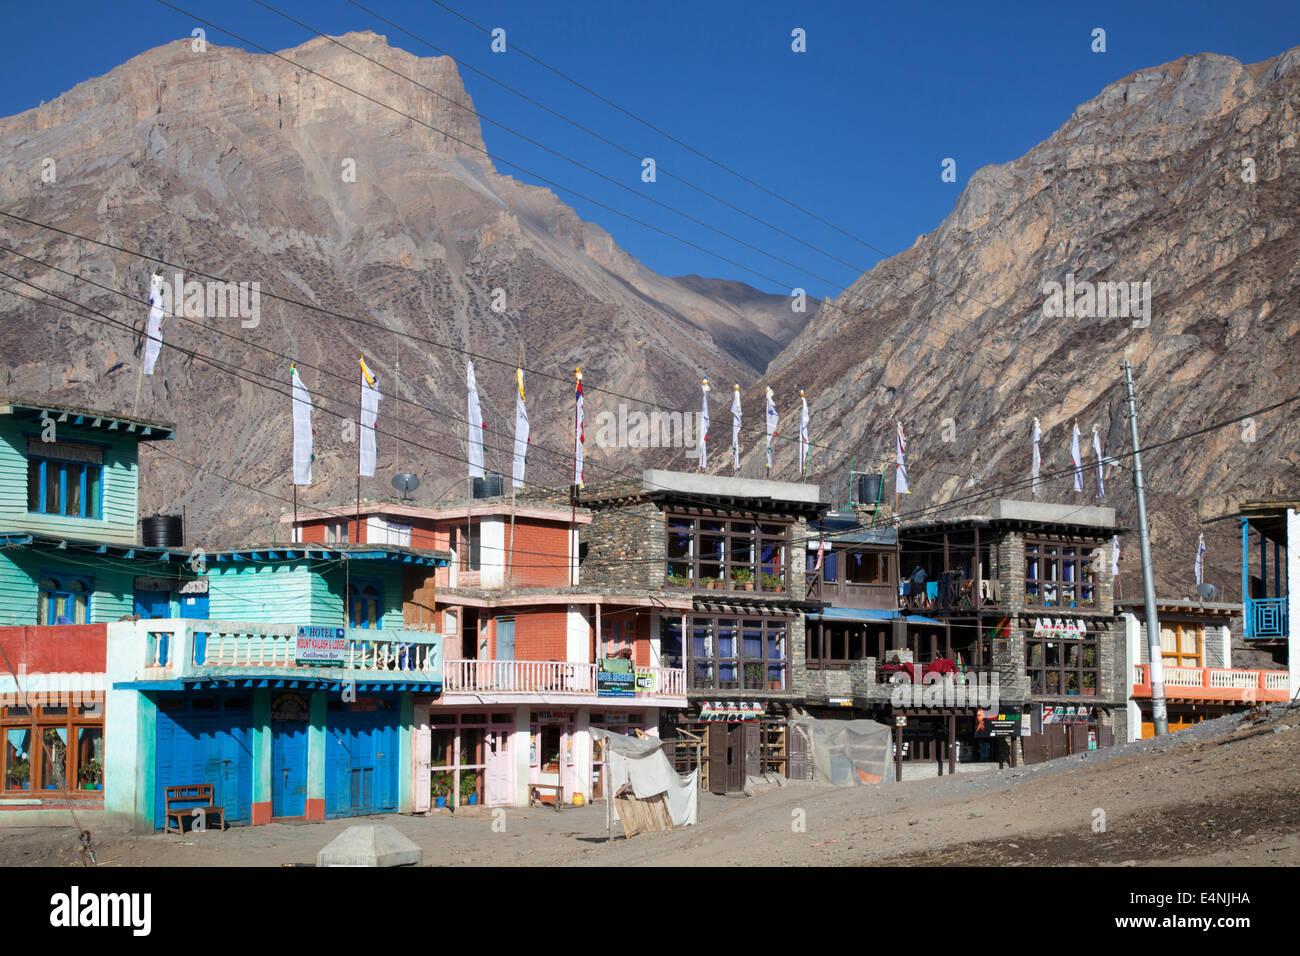 Muktinath Town, Annapurna Circuit, Mustang District, Nepal - Stock Image